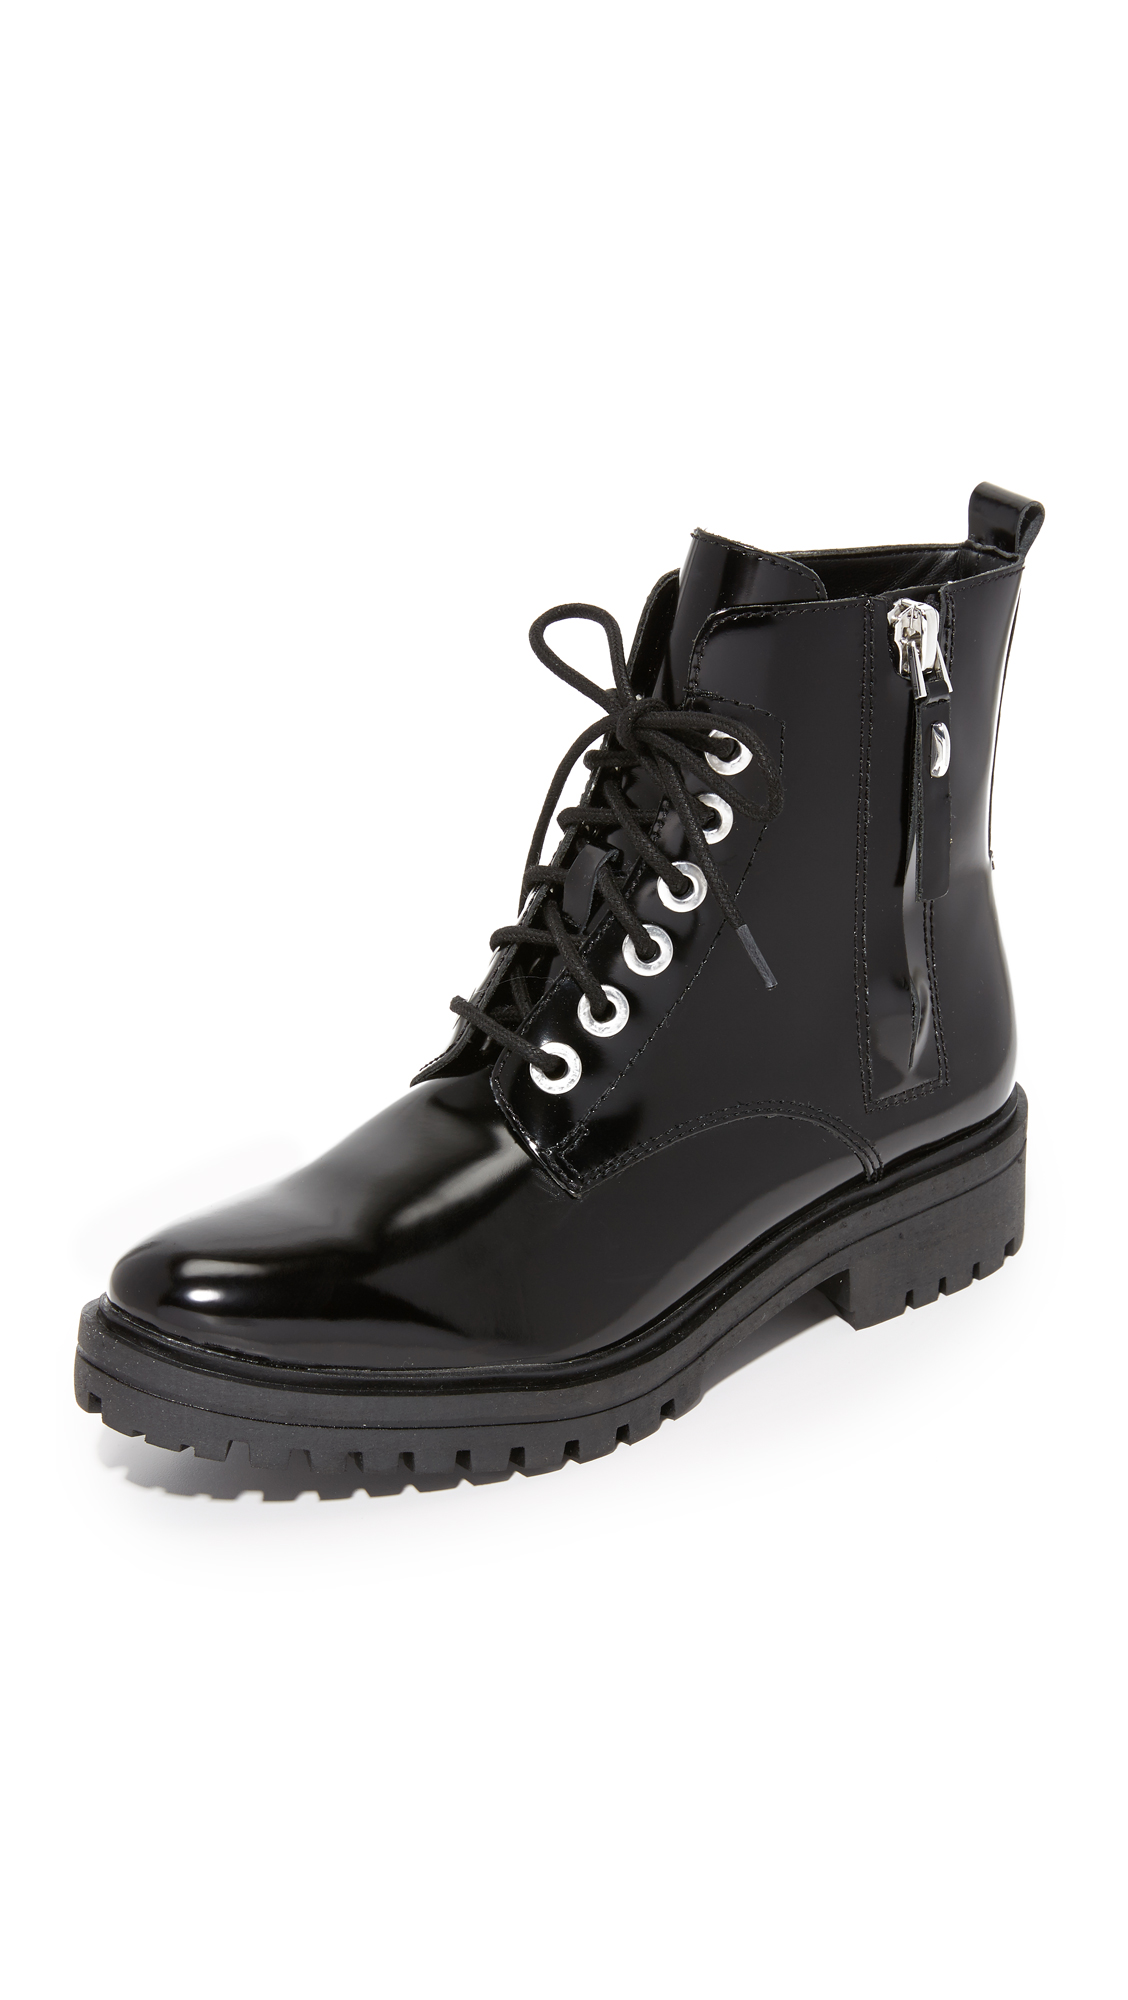 Photo of Kendall + Kylie Jordana Combat Boots Black - KENDALL + KYLIE online